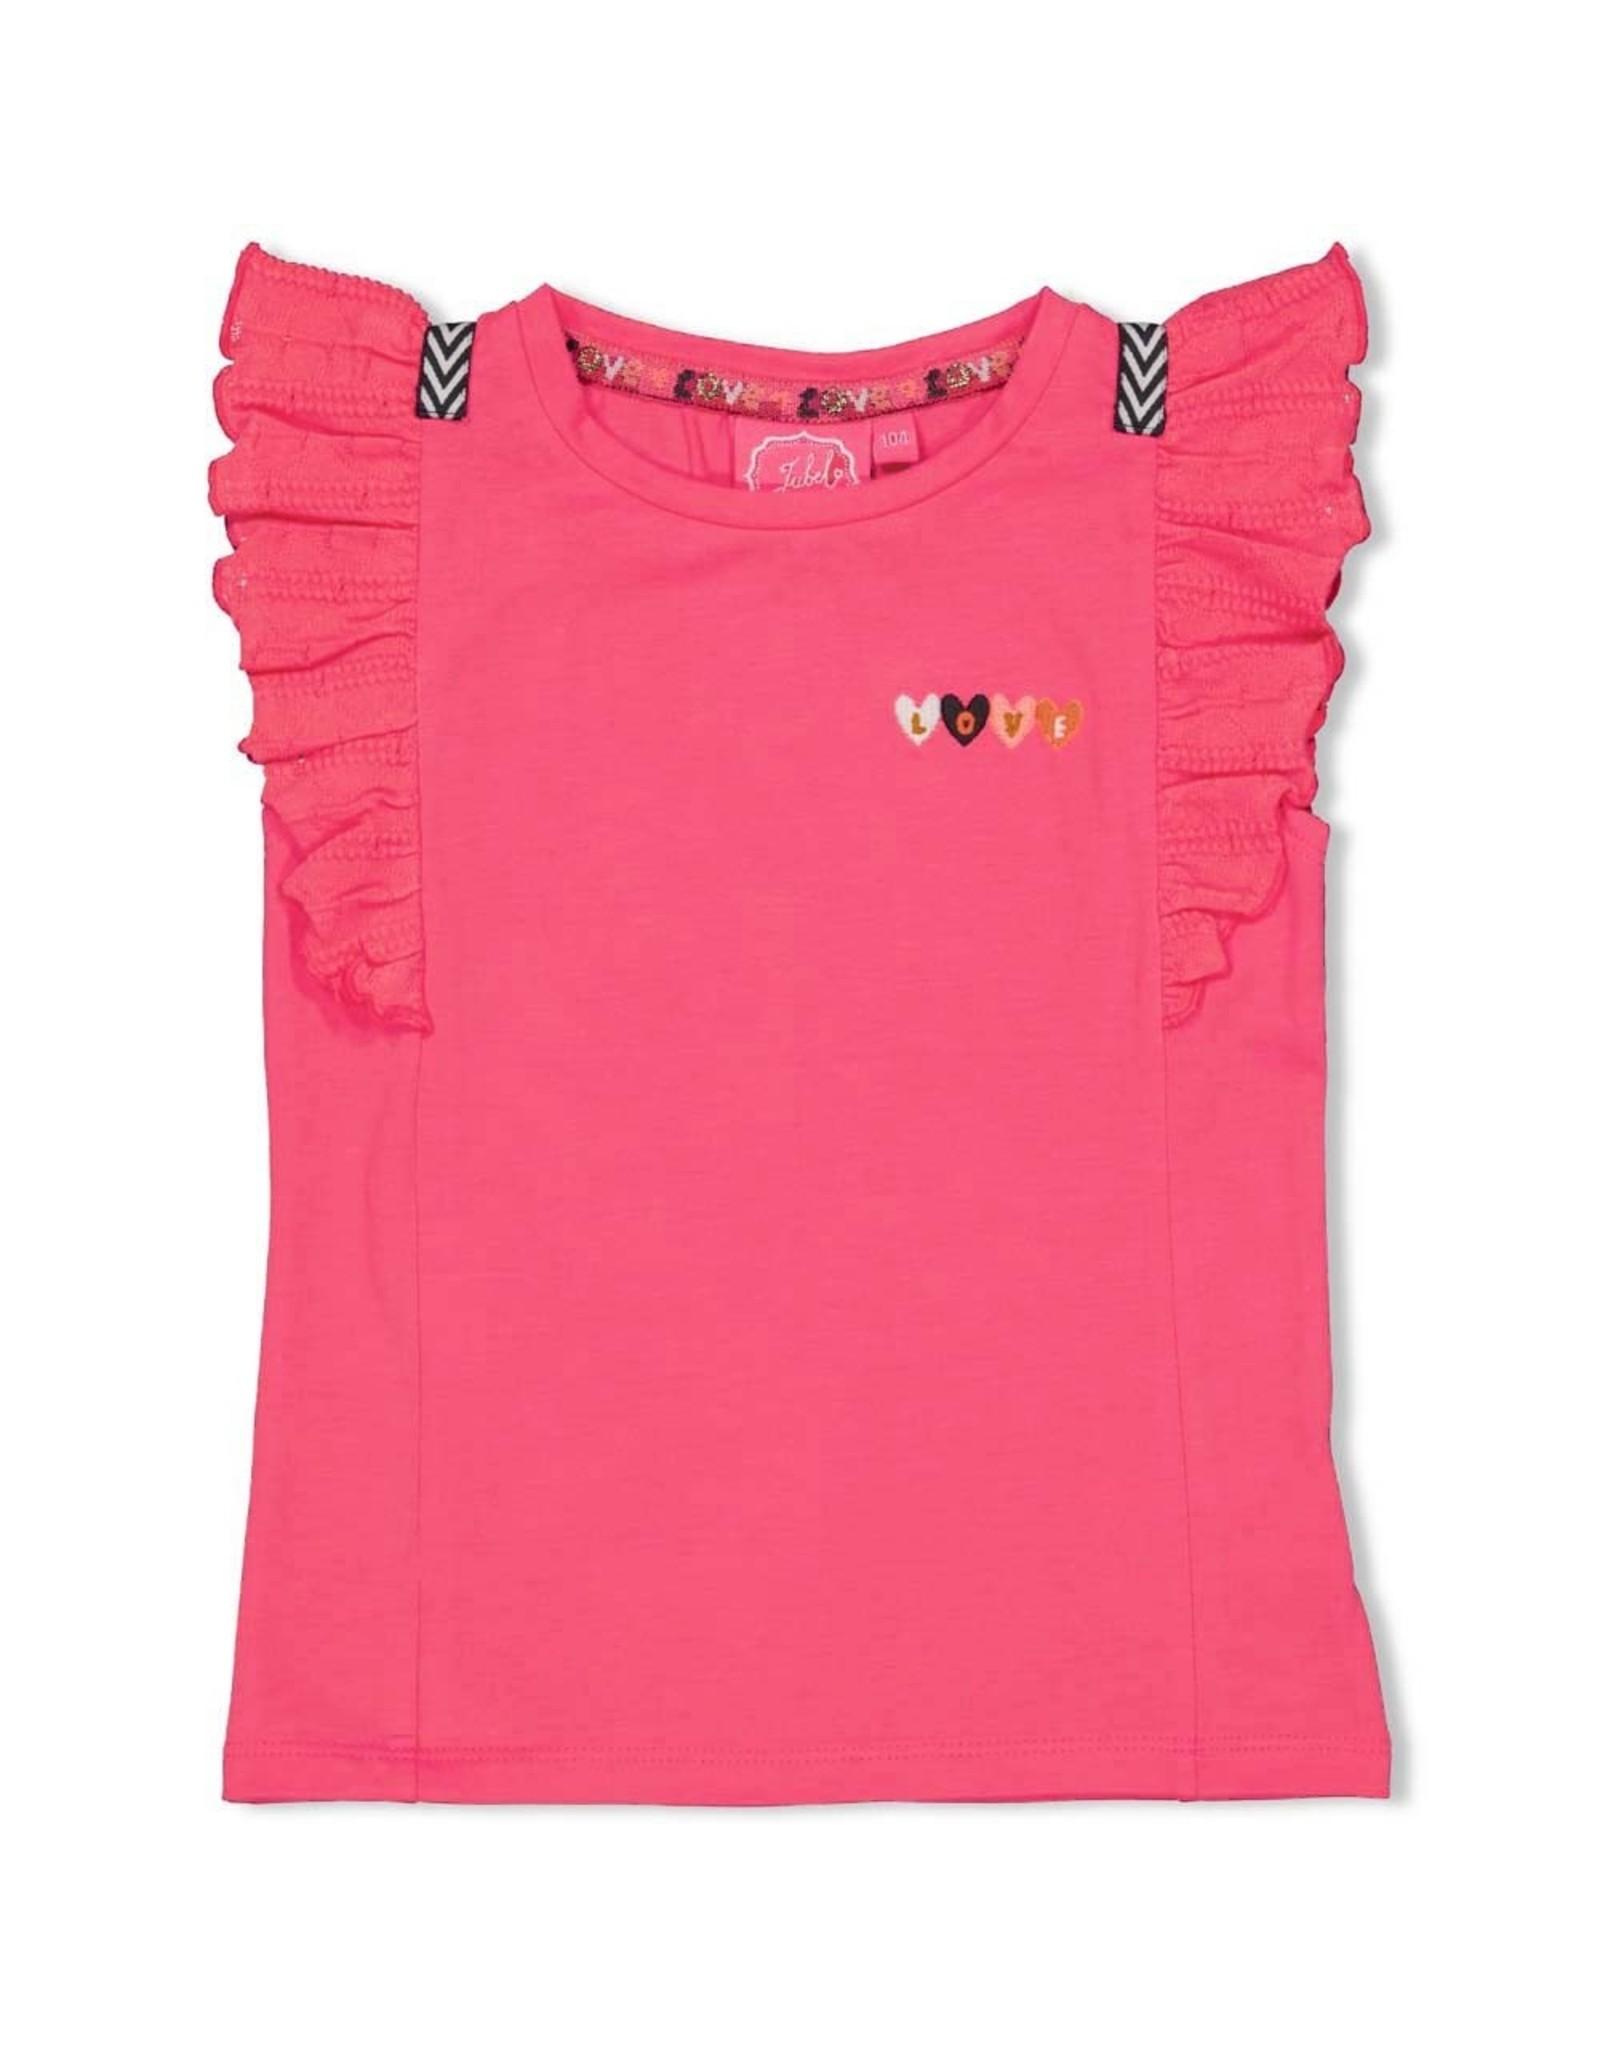 Jubel T-shirt fuchsia - Whoopsie Daisy